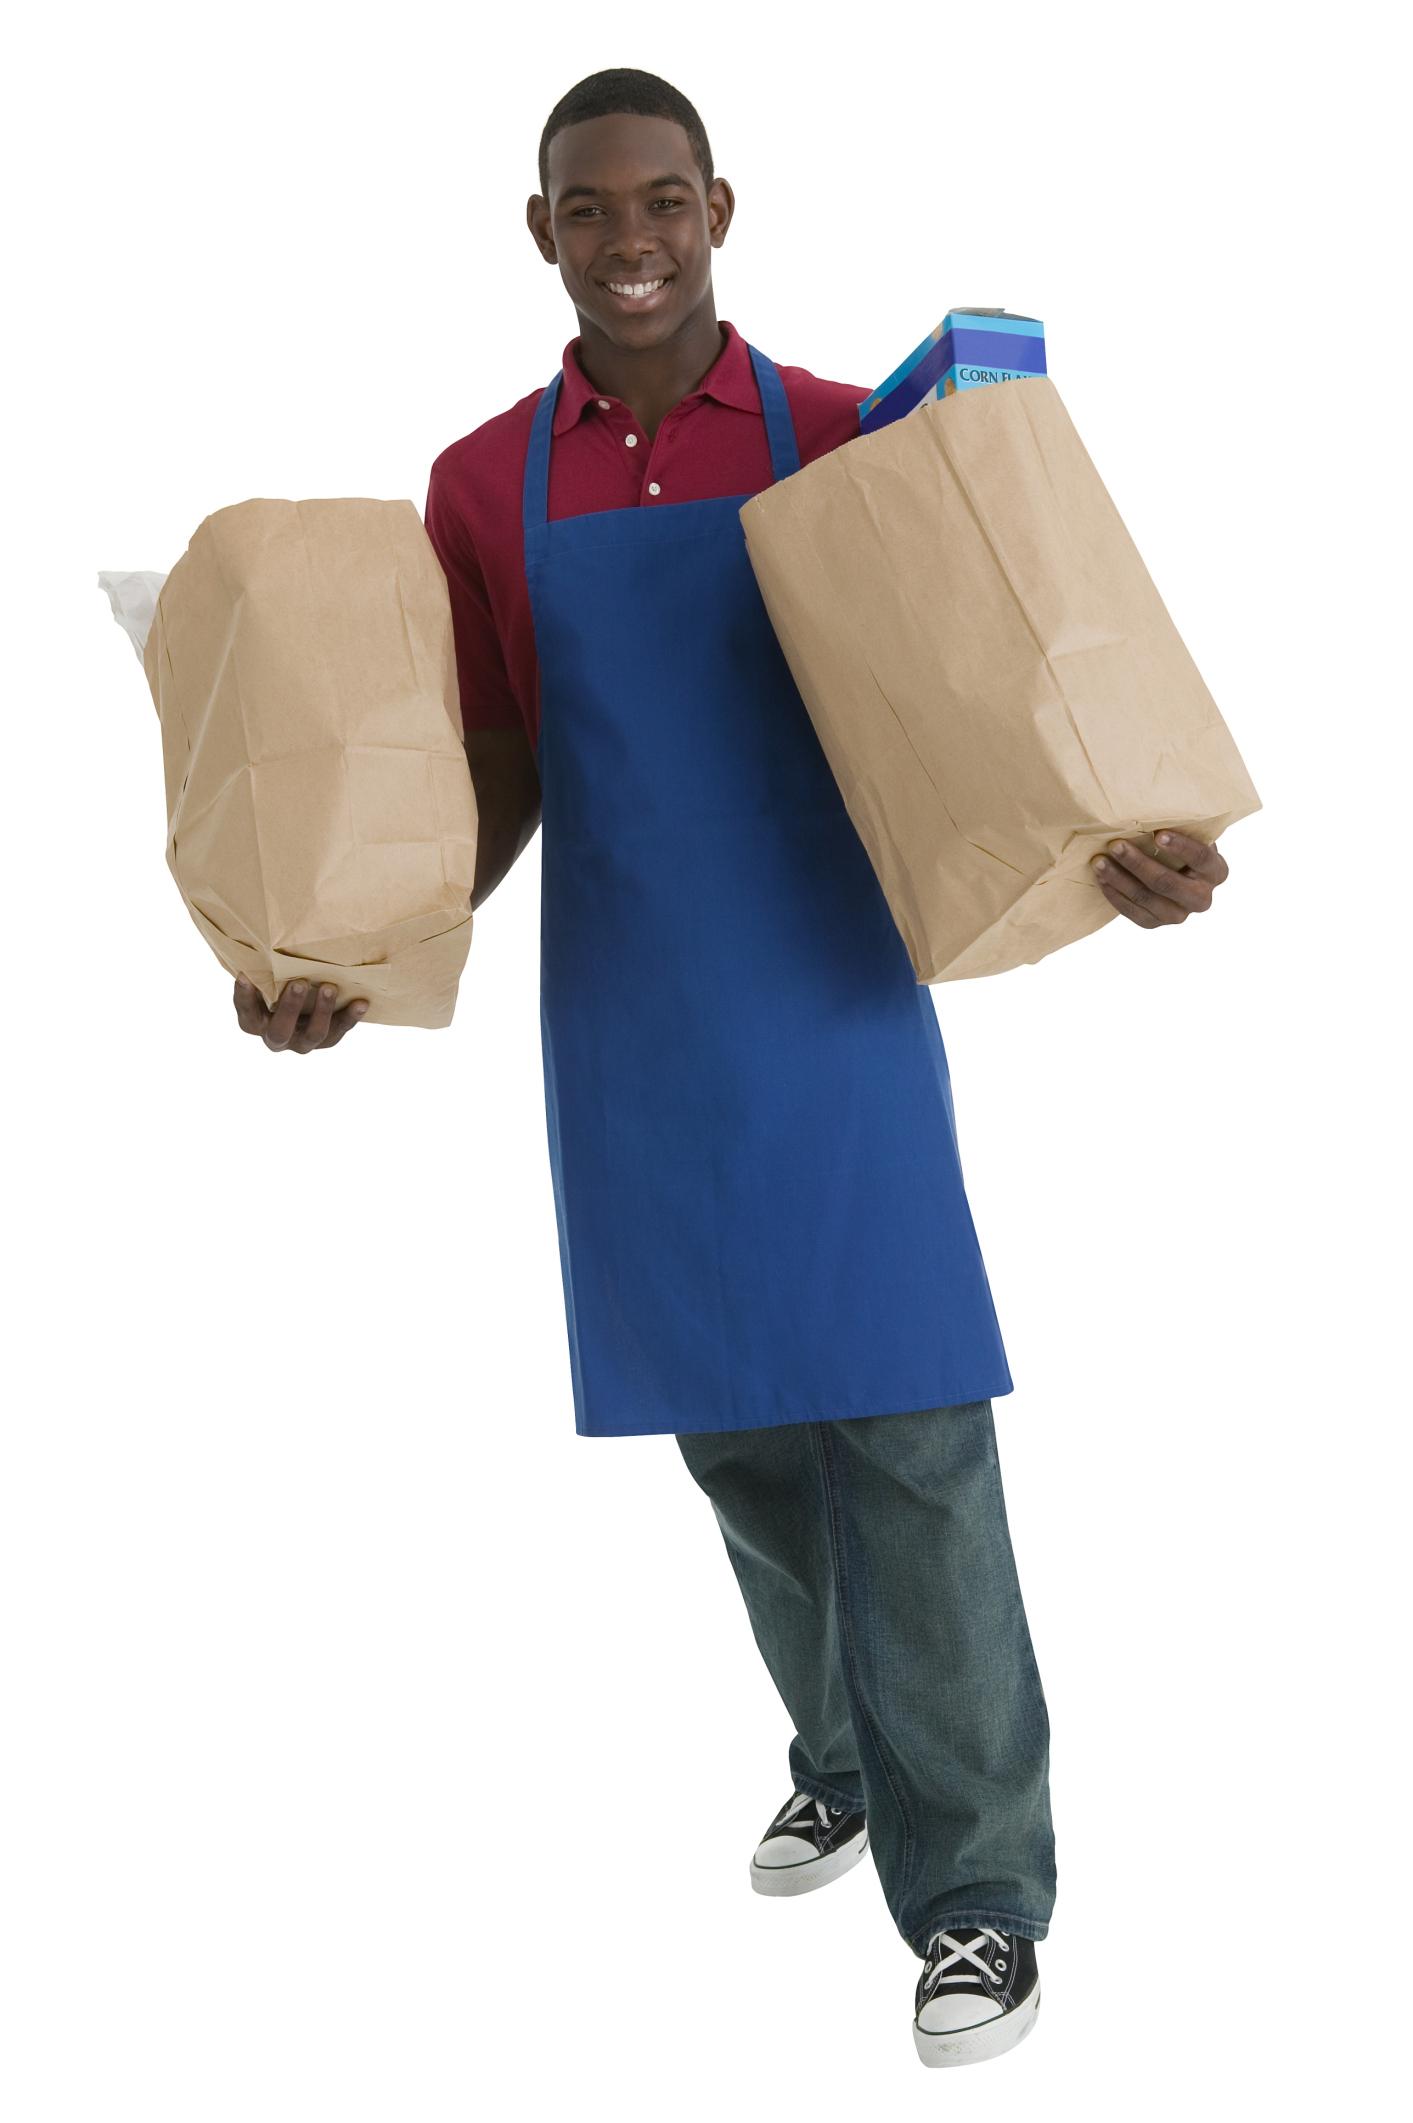 How Old Do You Have To Be To Work As A Bag Boy